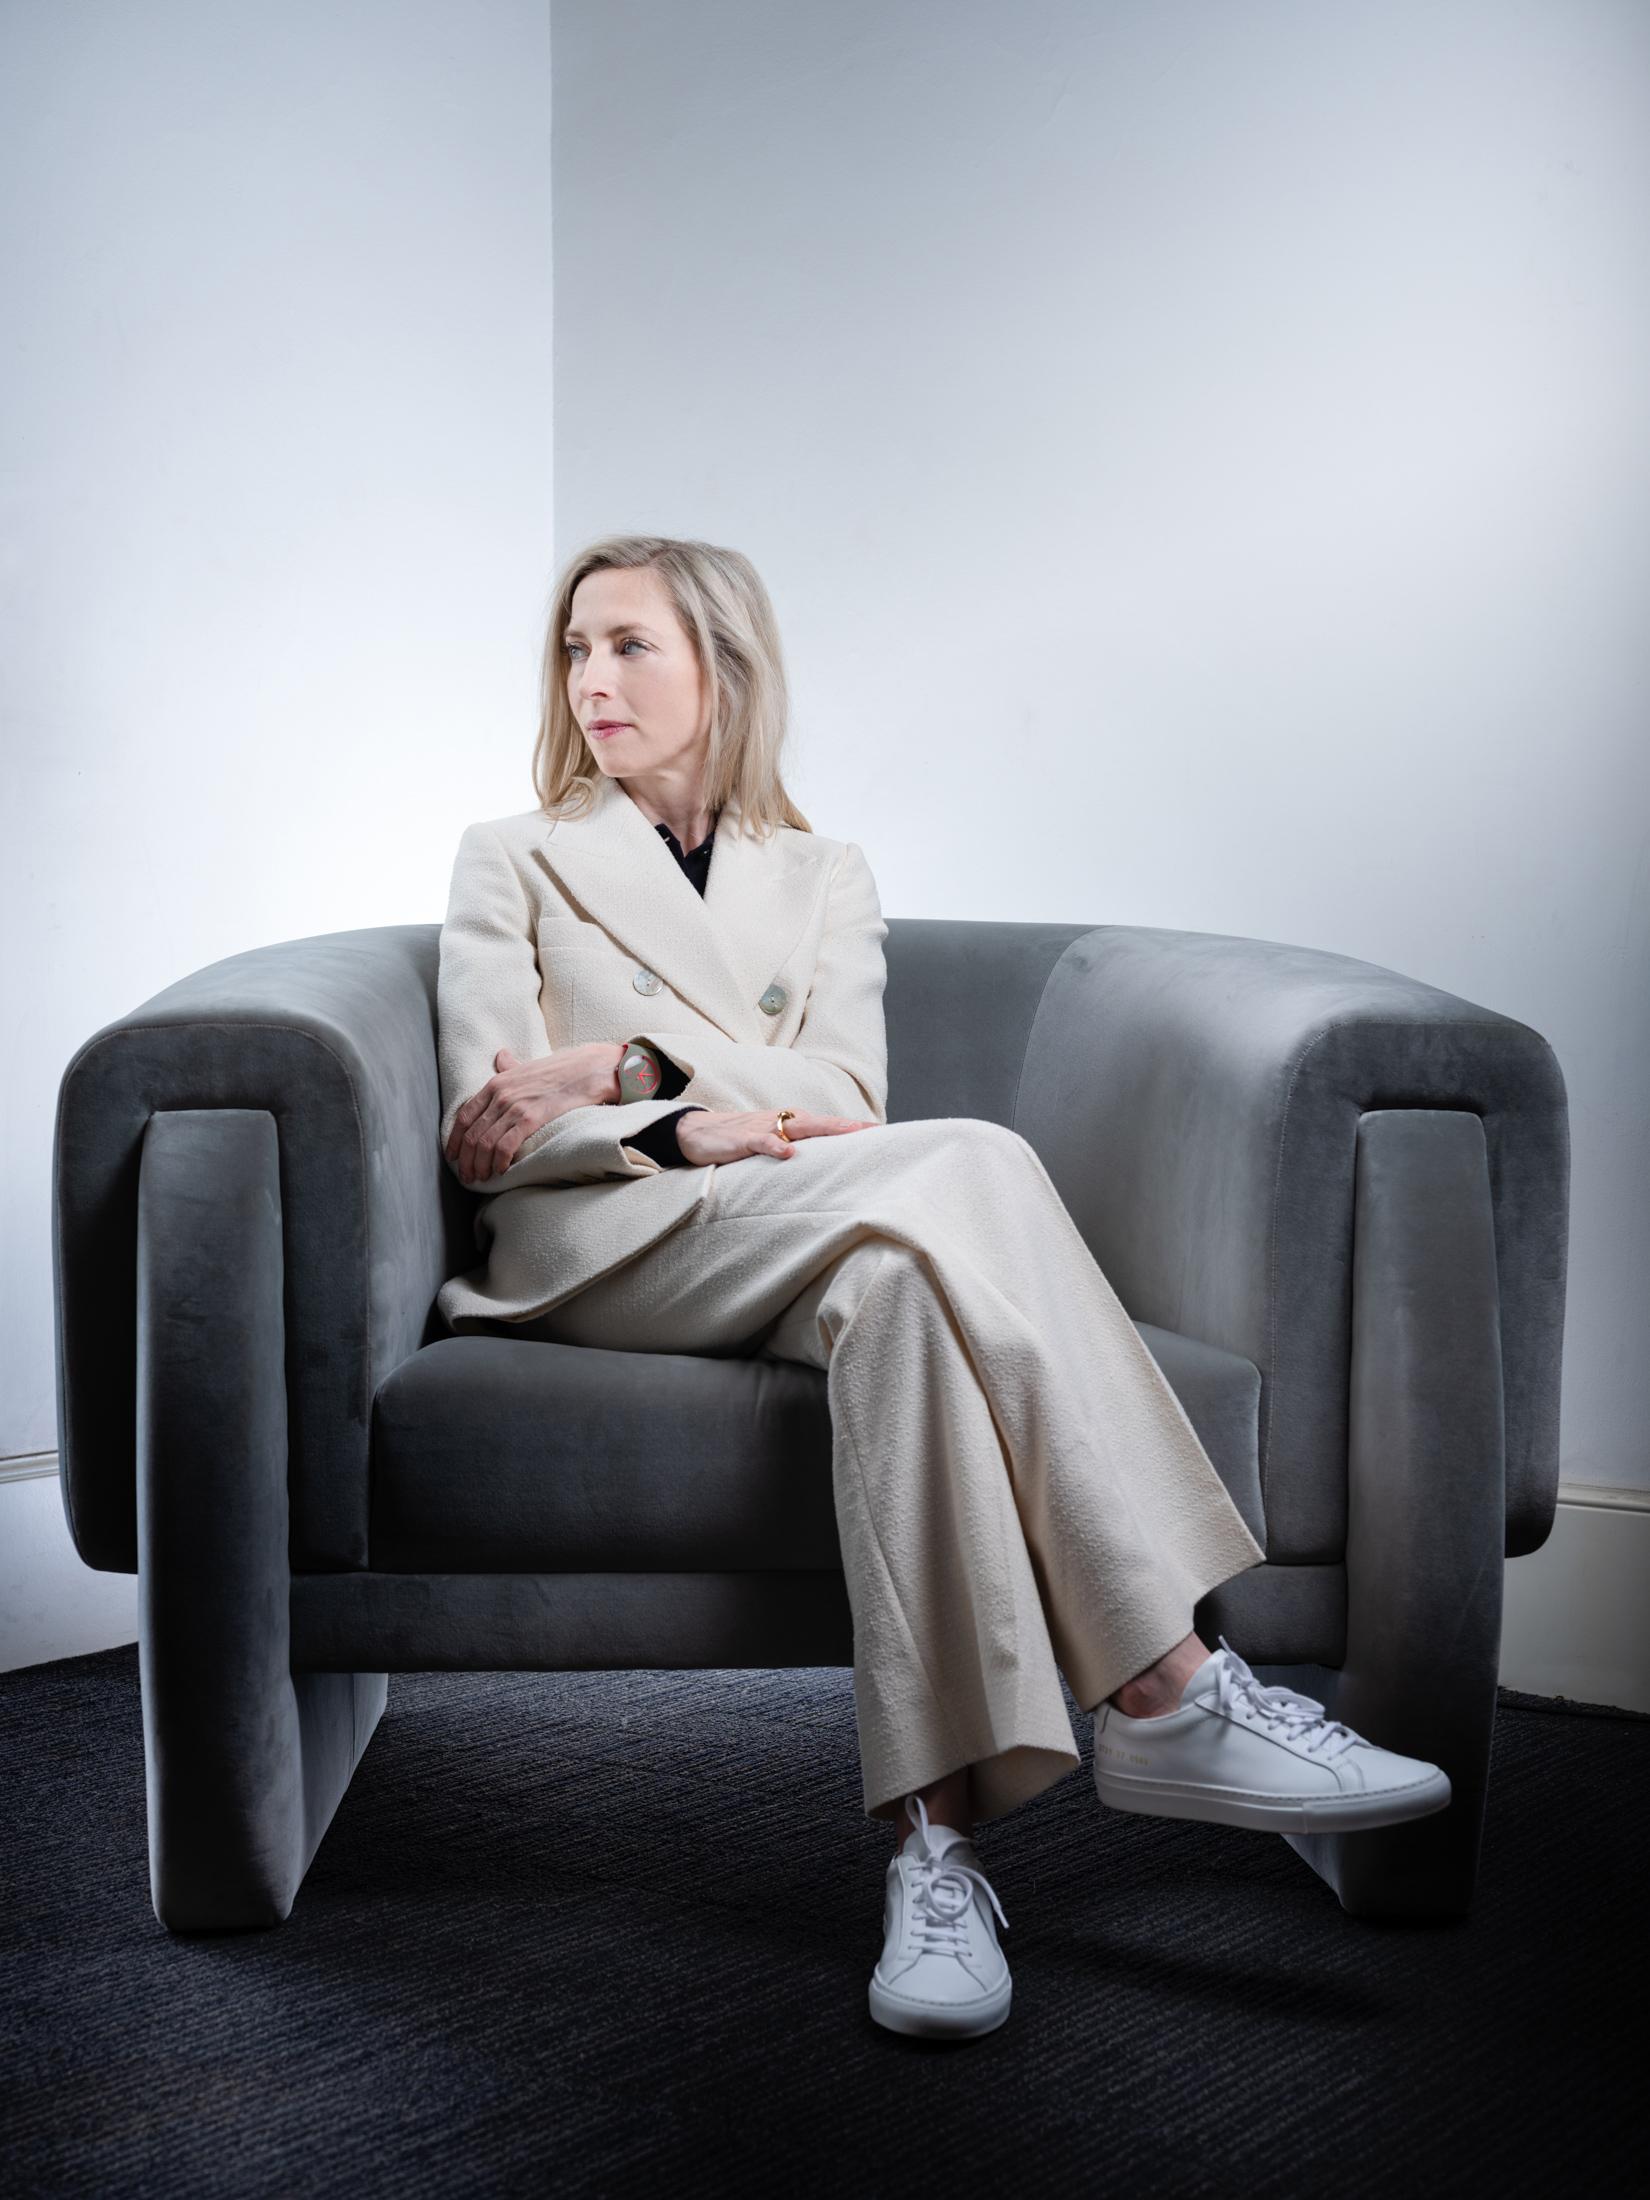 Jessica-Hausner-1